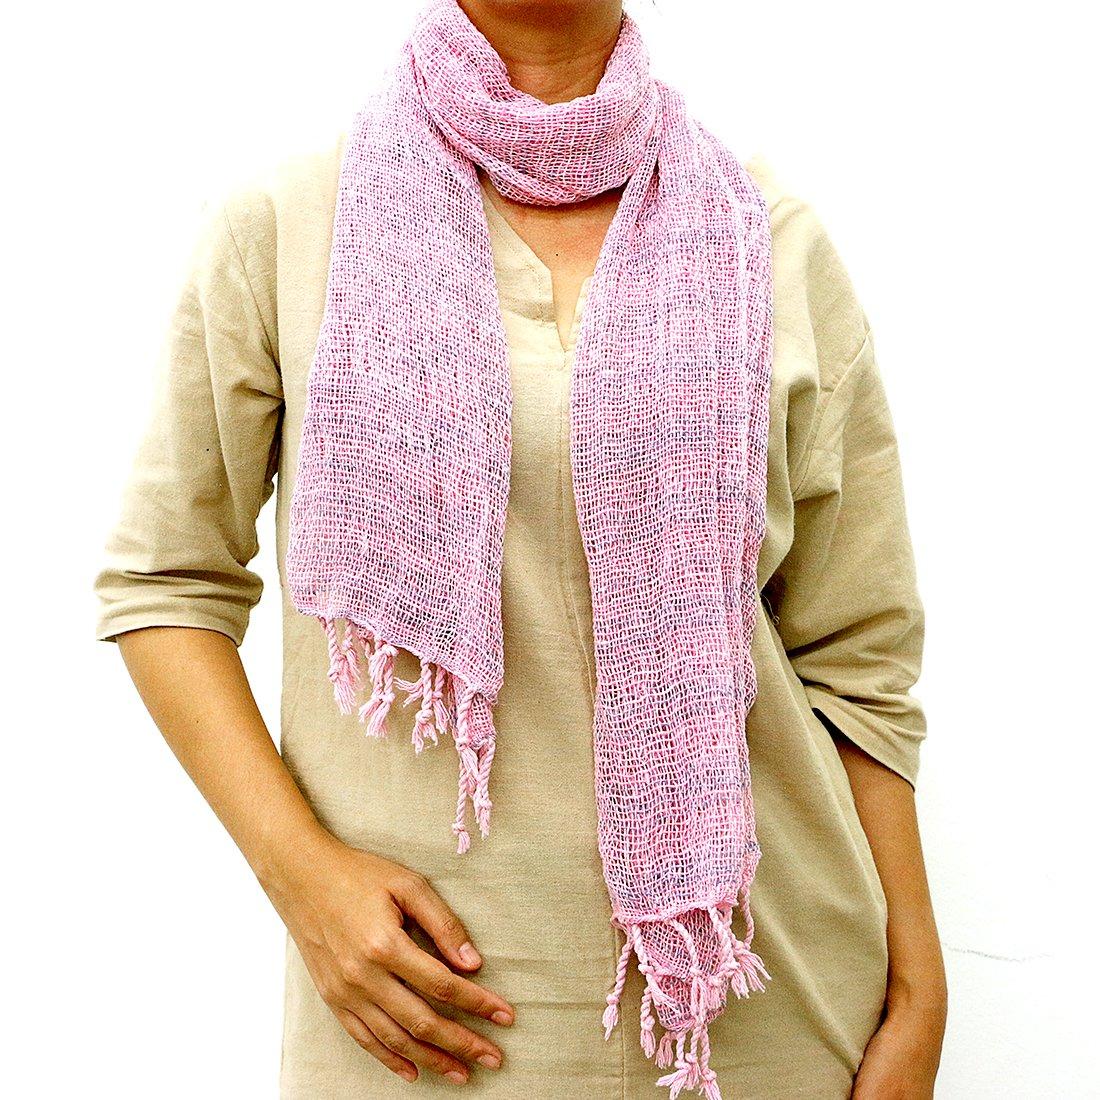 Taruron Woven Net Cotton Plain or Multi Colors Summer fashionable Scarf (Pink)